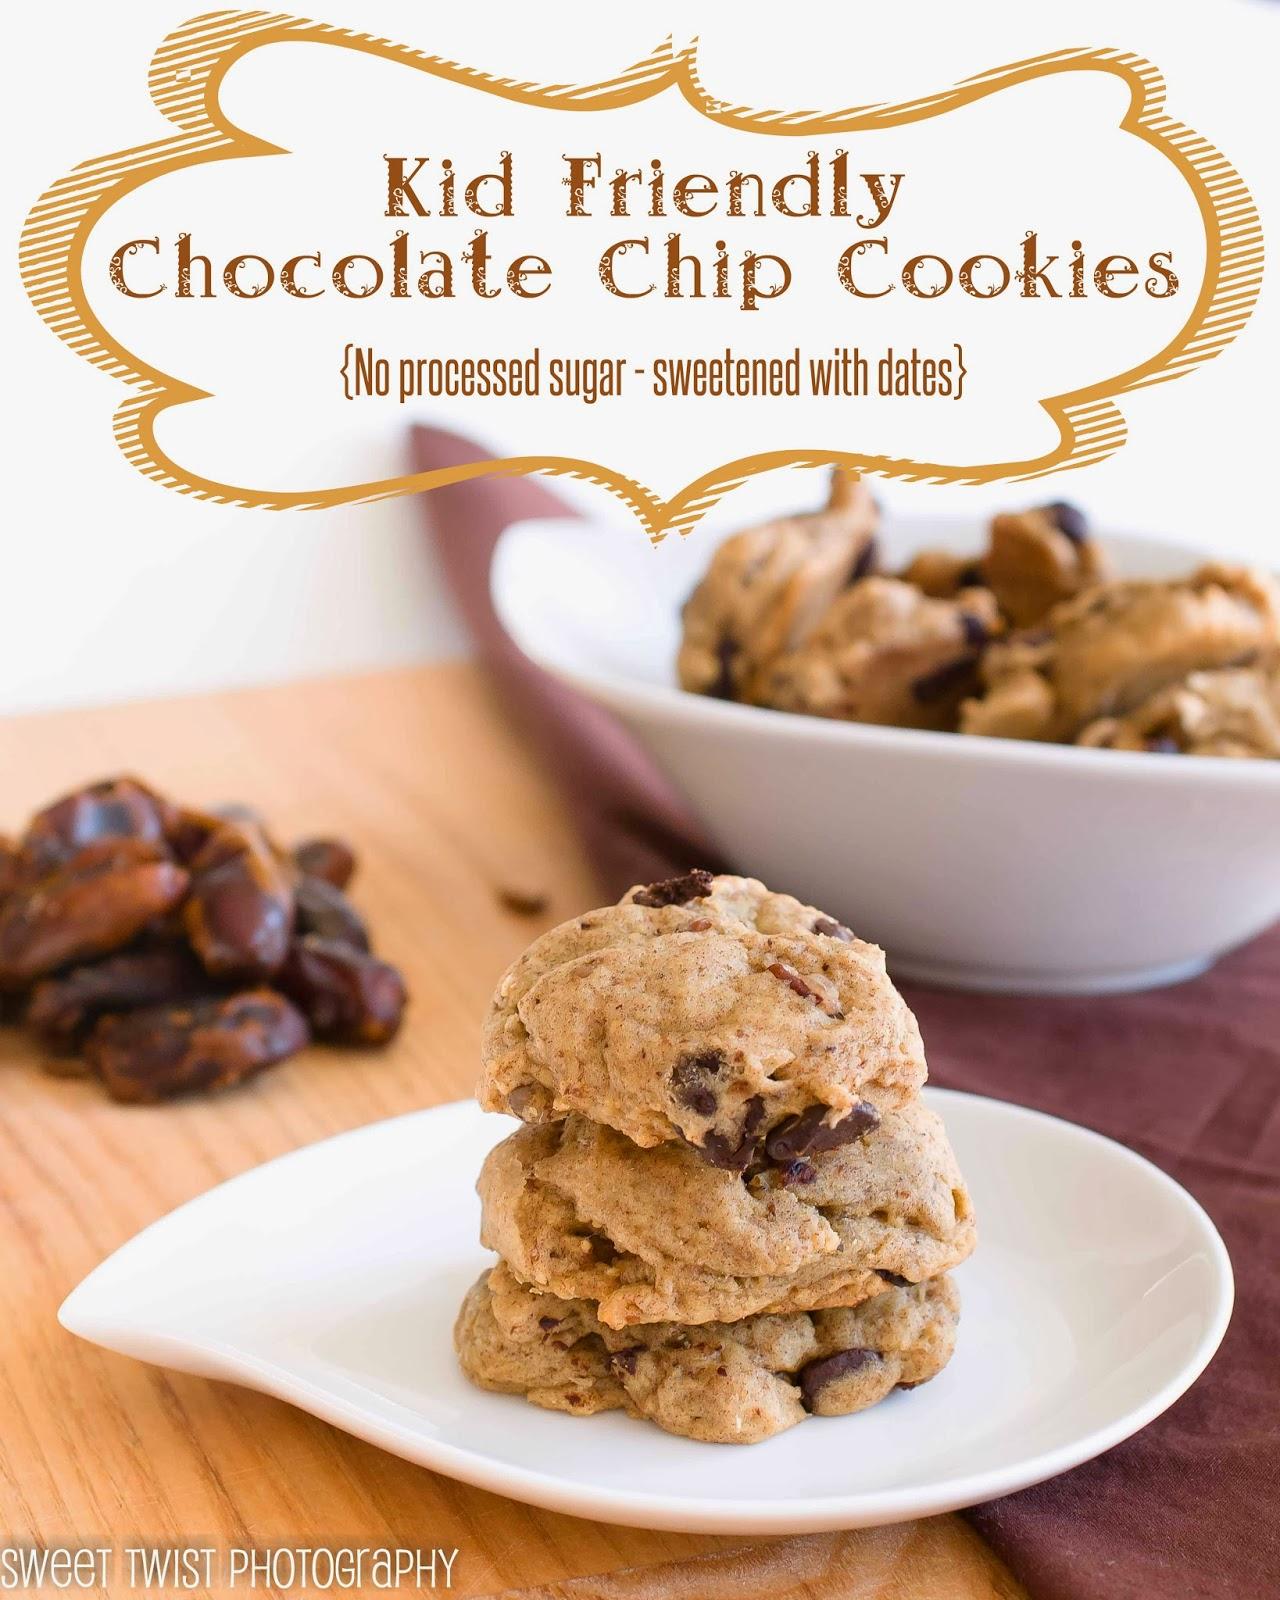 Kid Friendly Backyard Landscaping: Sweet Twist Of Blogging: Kid Friendly Chocolate Chip Cookies